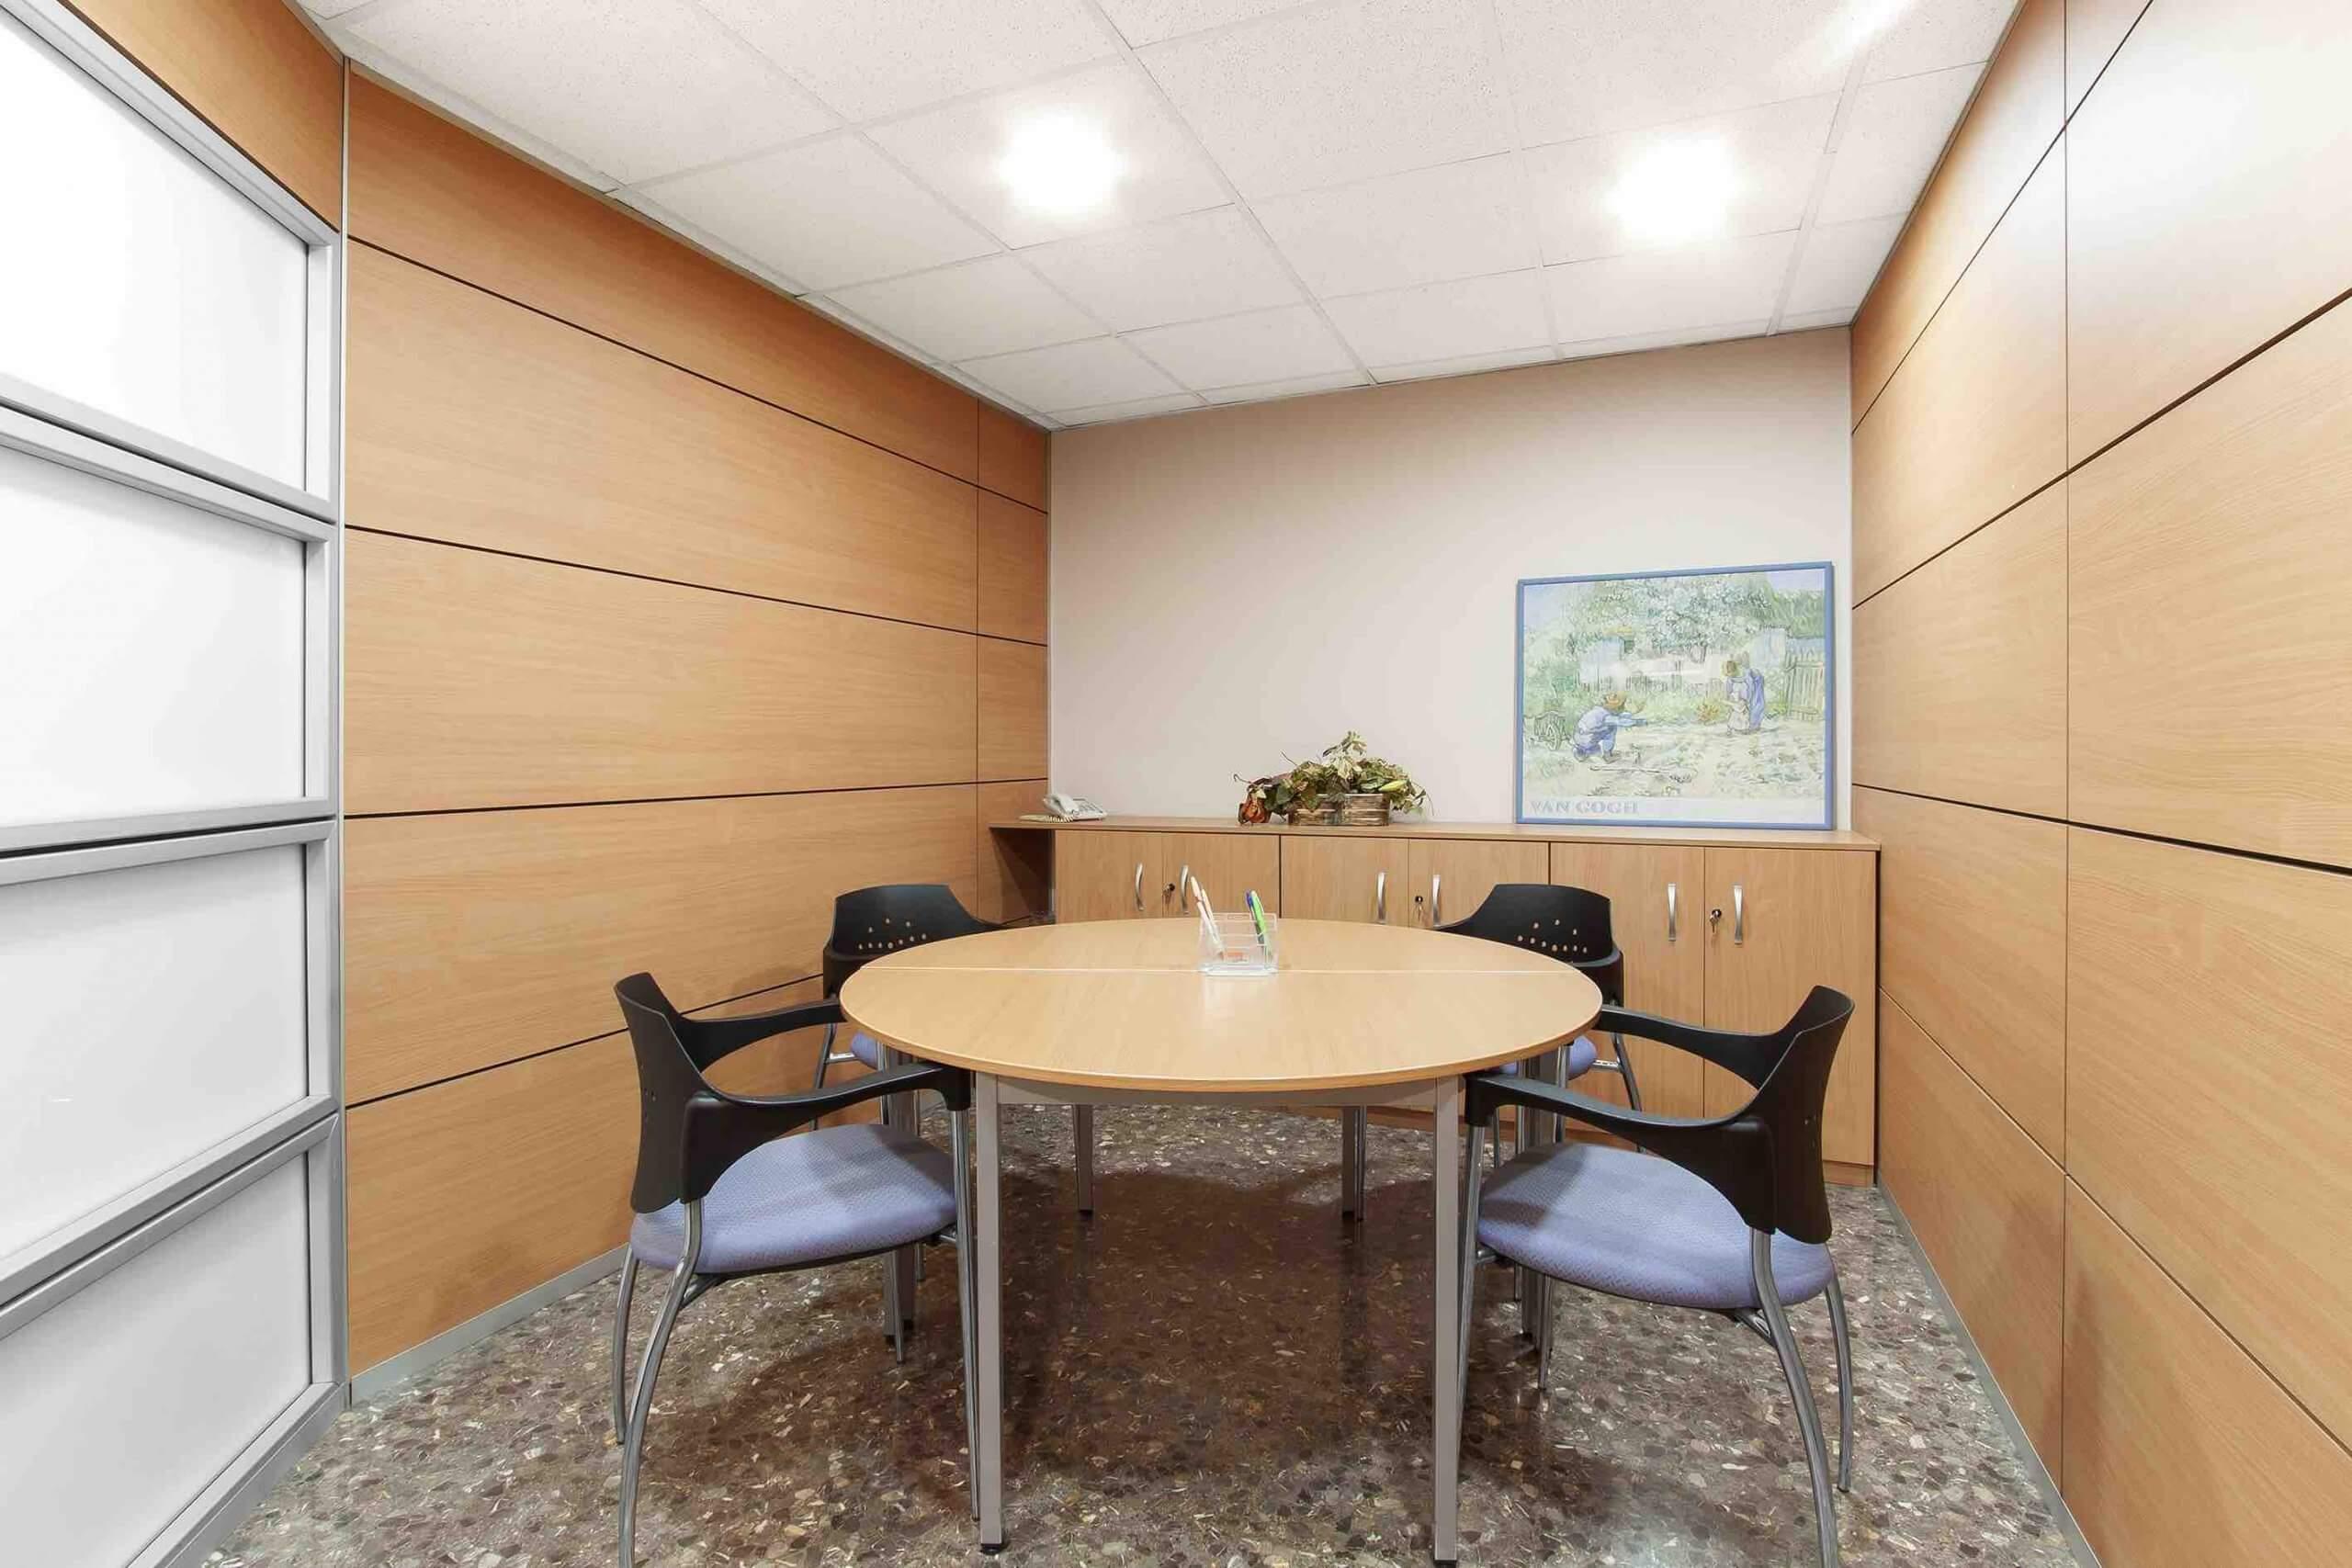 sala de reuniones economica barcelona